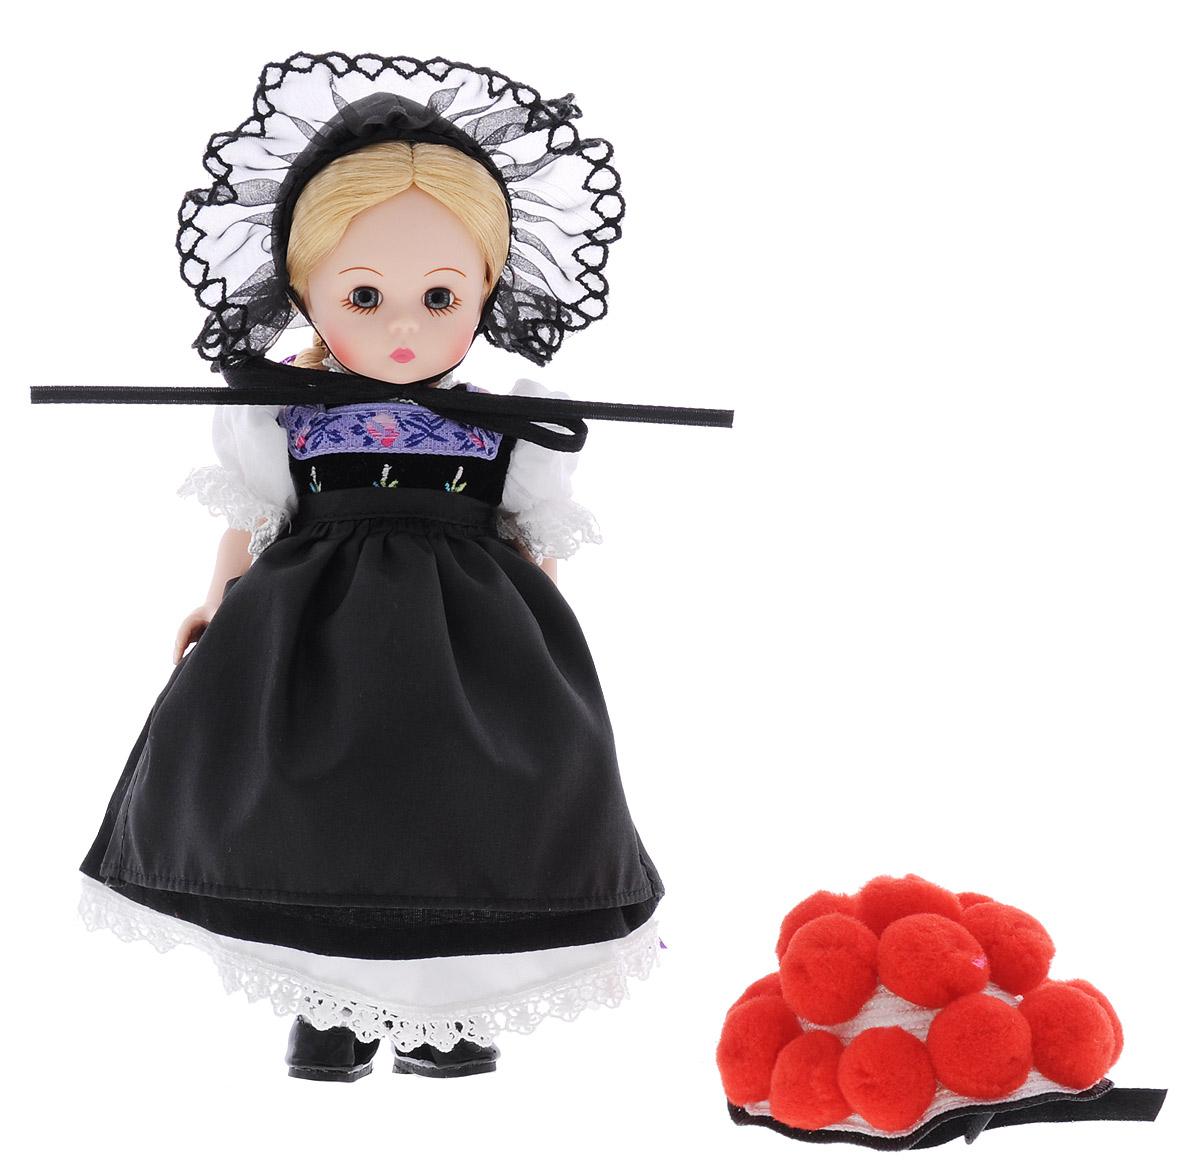 Madame Alexander Мини-кукла Девочка из Германии куклы и одежда для кукол madame alexander кукла фэнси нэнси русалочка 20 см